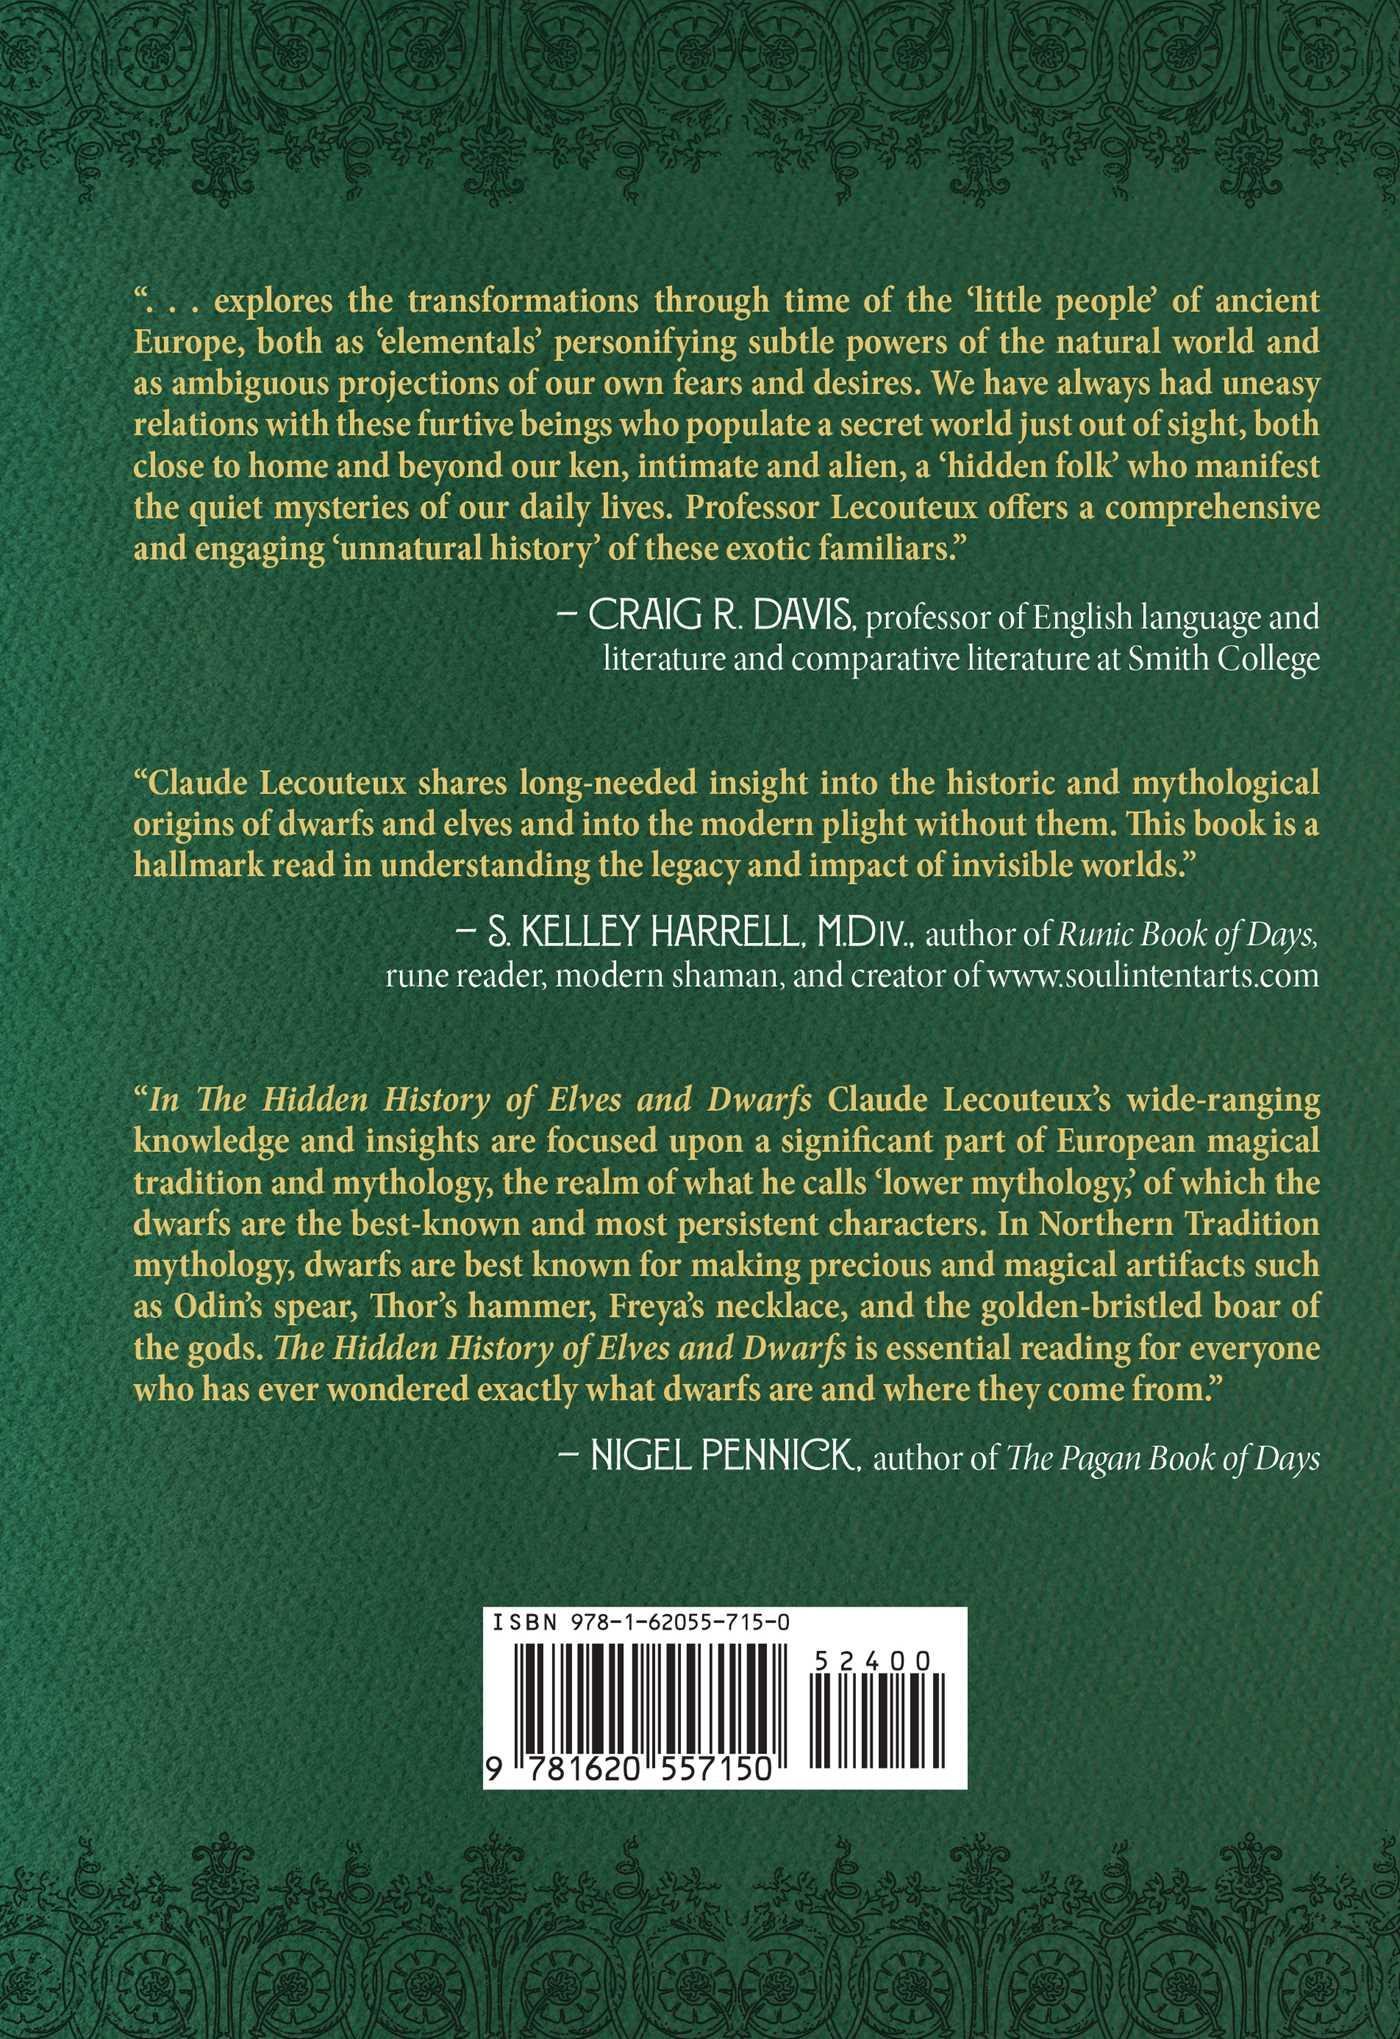 The hidden history of elves and dwarfs 9781620557150 hr back